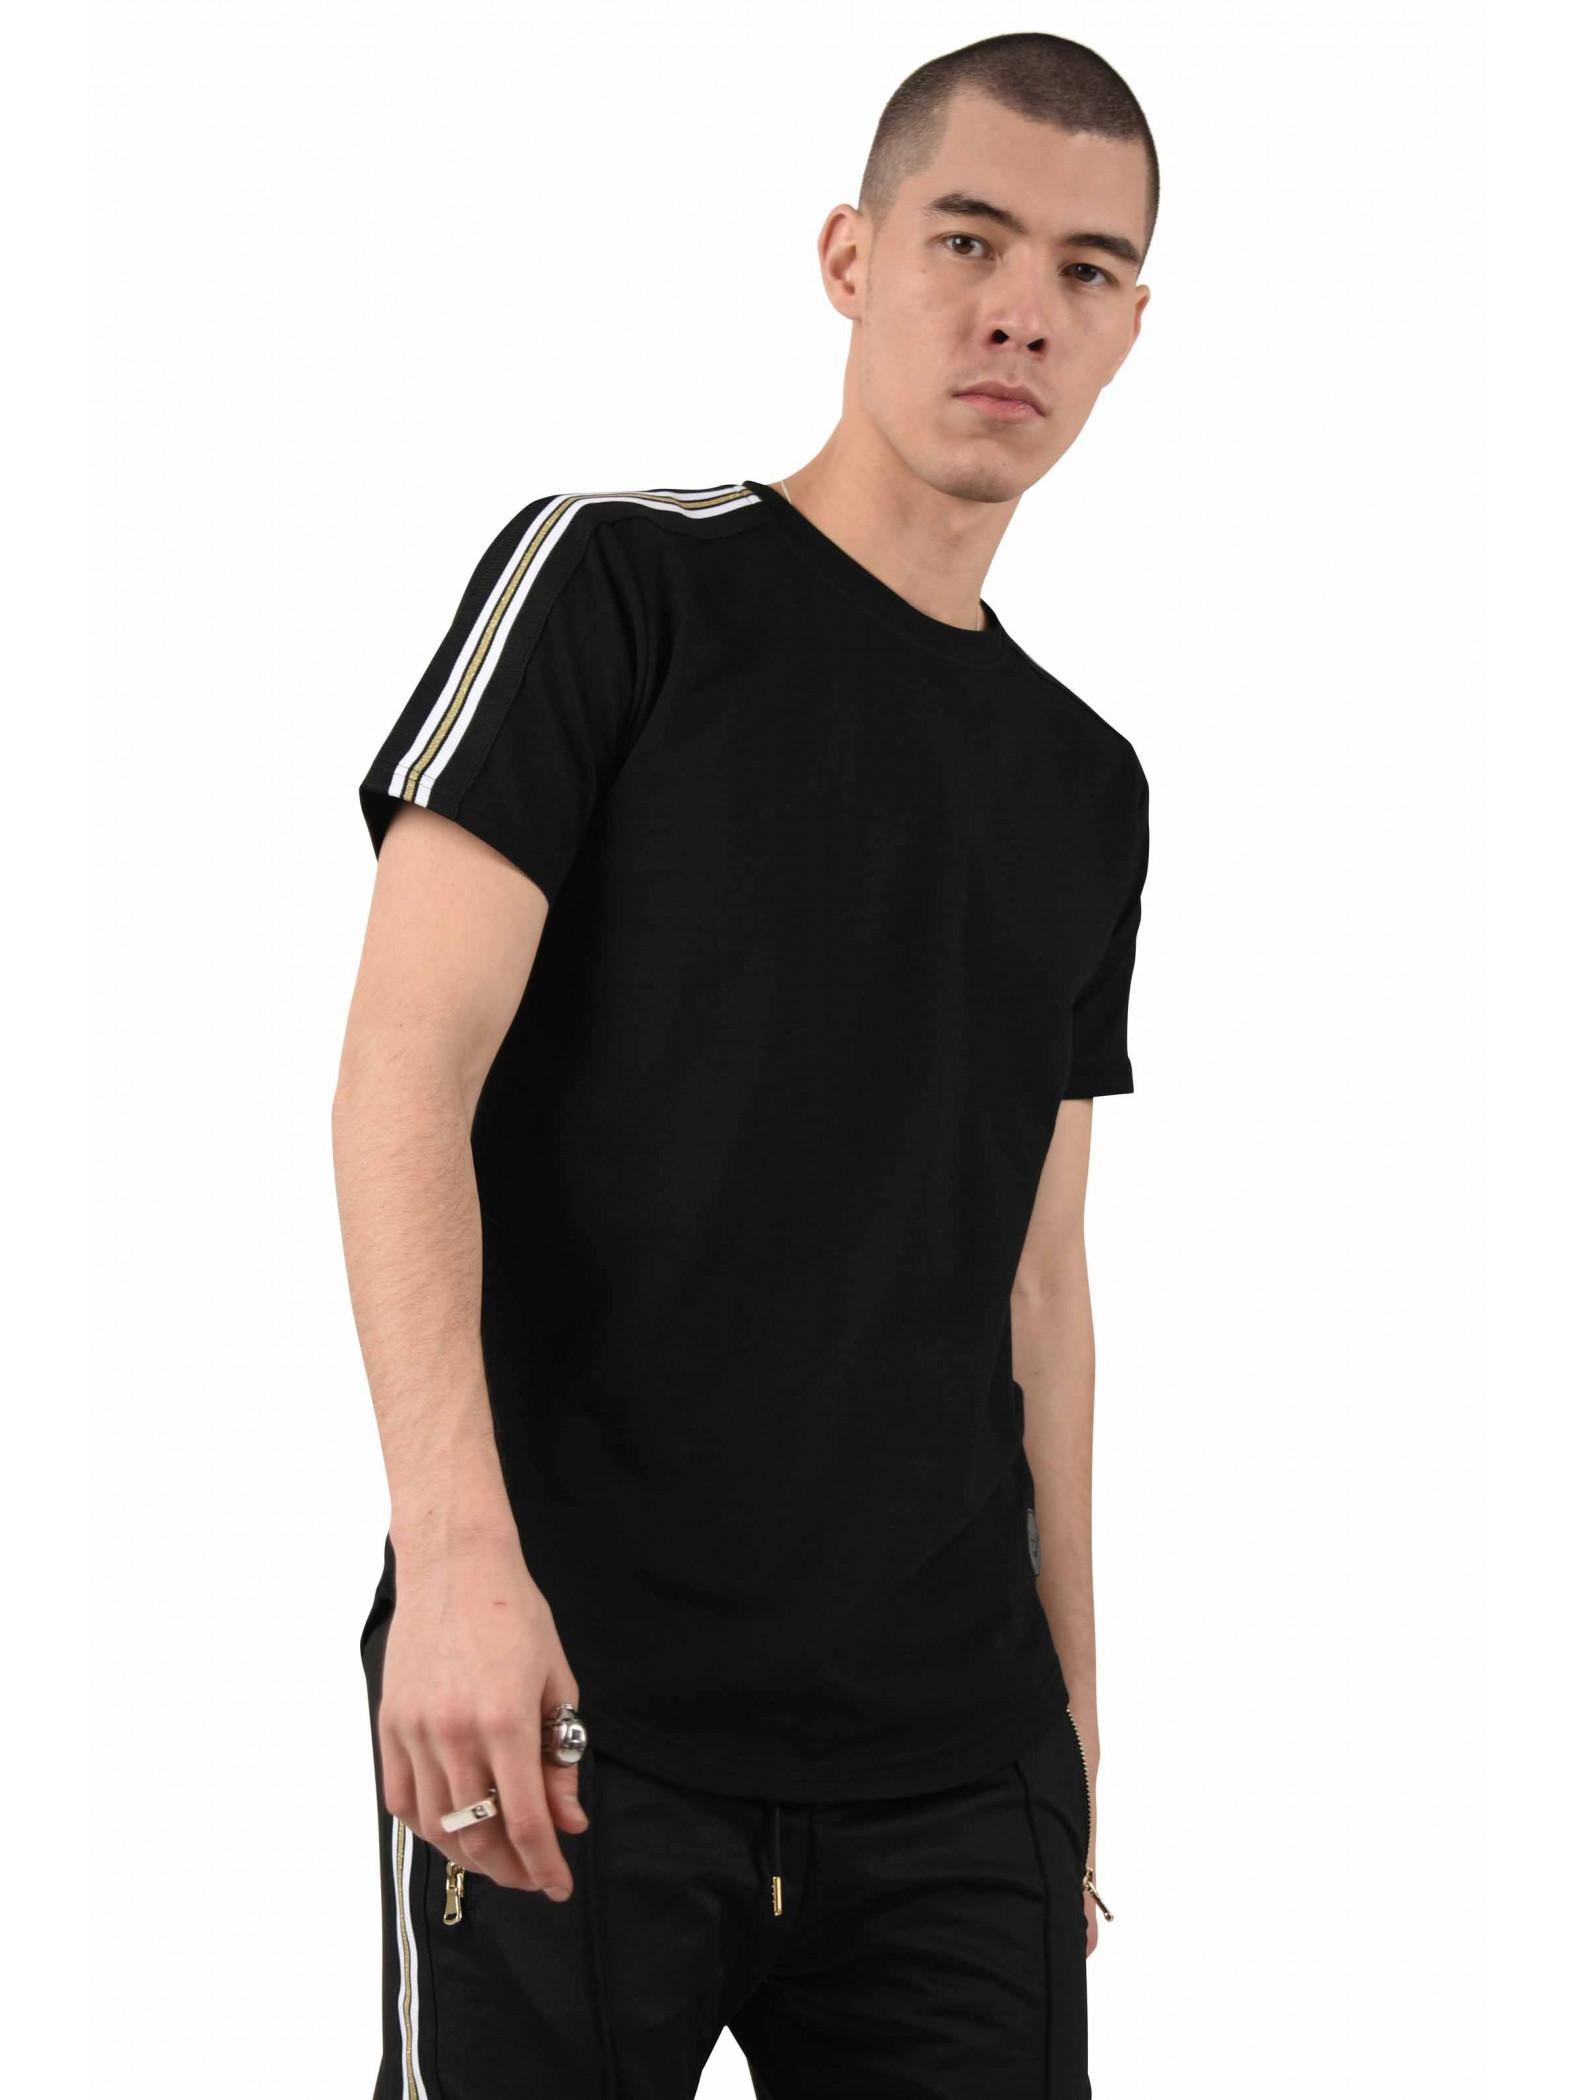 tee shirt uni bandes contrastantes dor es homme project x paris. Black Bedroom Furniture Sets. Home Design Ideas